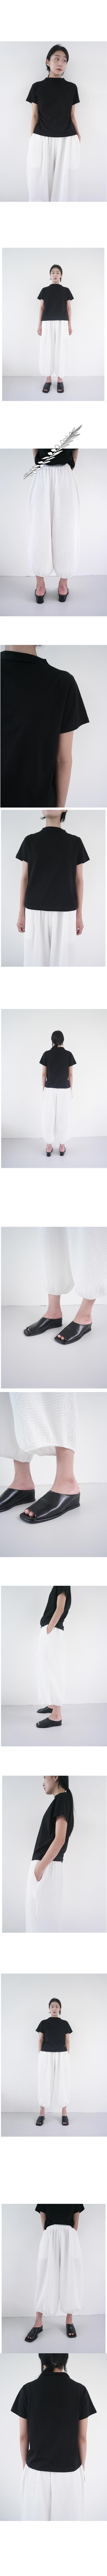 loafer shape classic mule